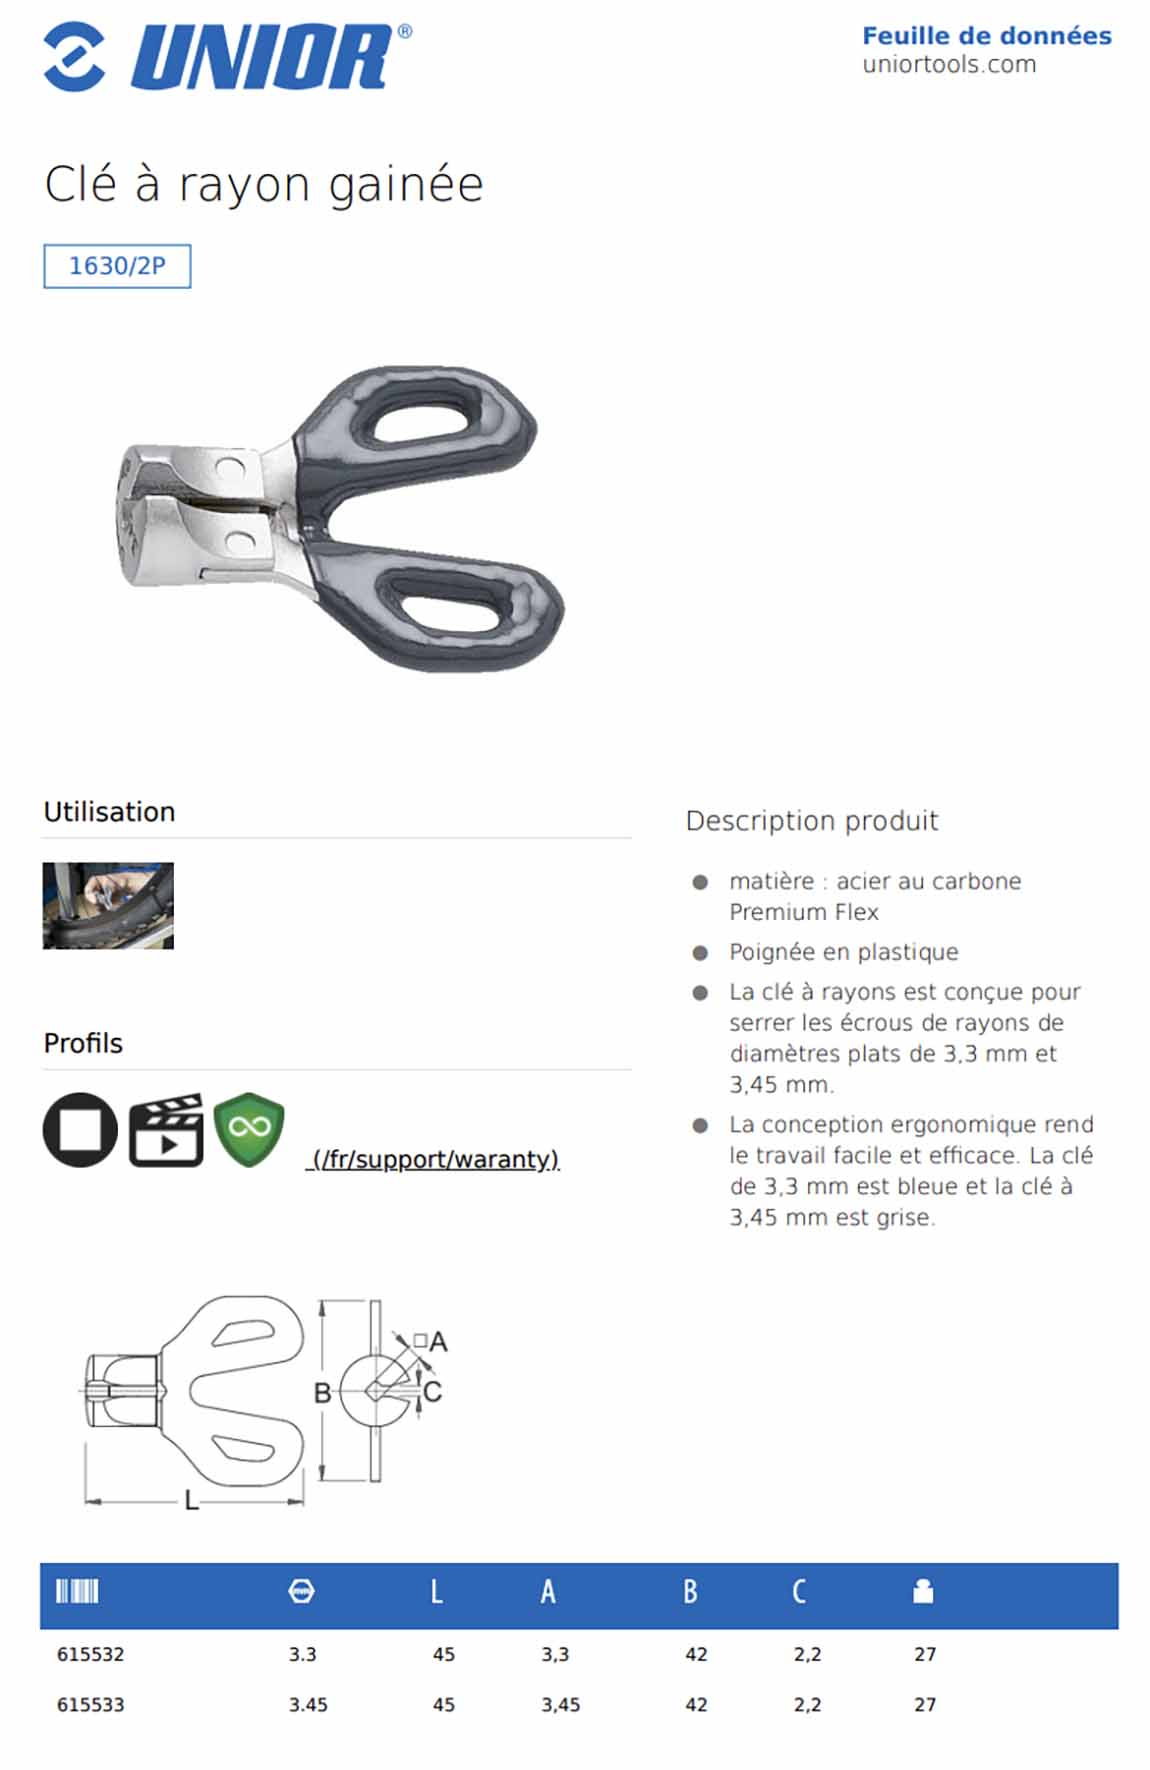 tension de rayon de velo clé Unior 1630/2P